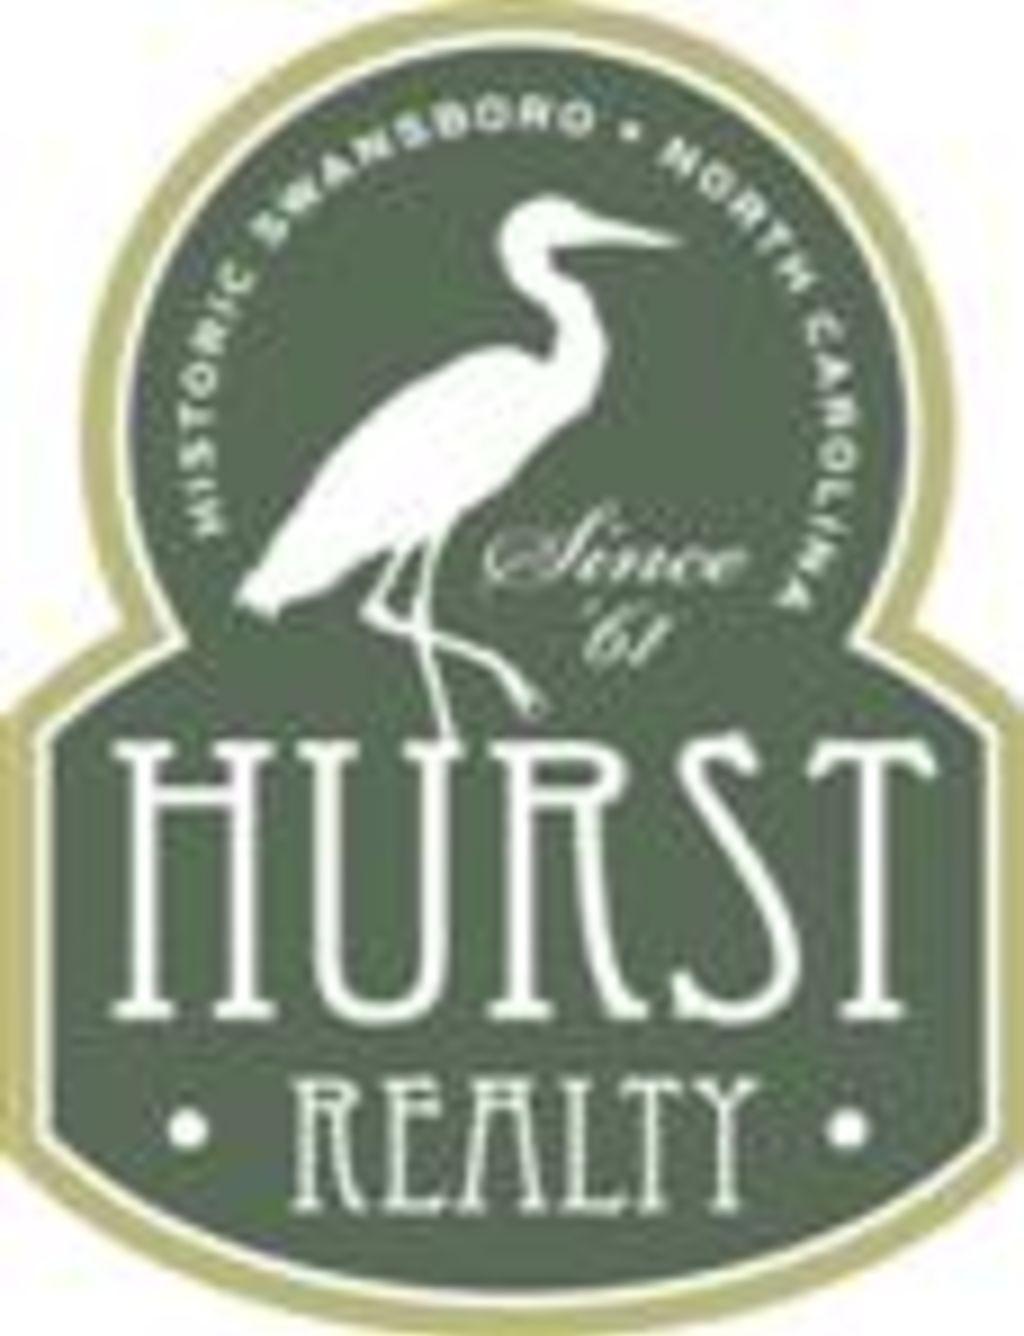 Hurst Realty